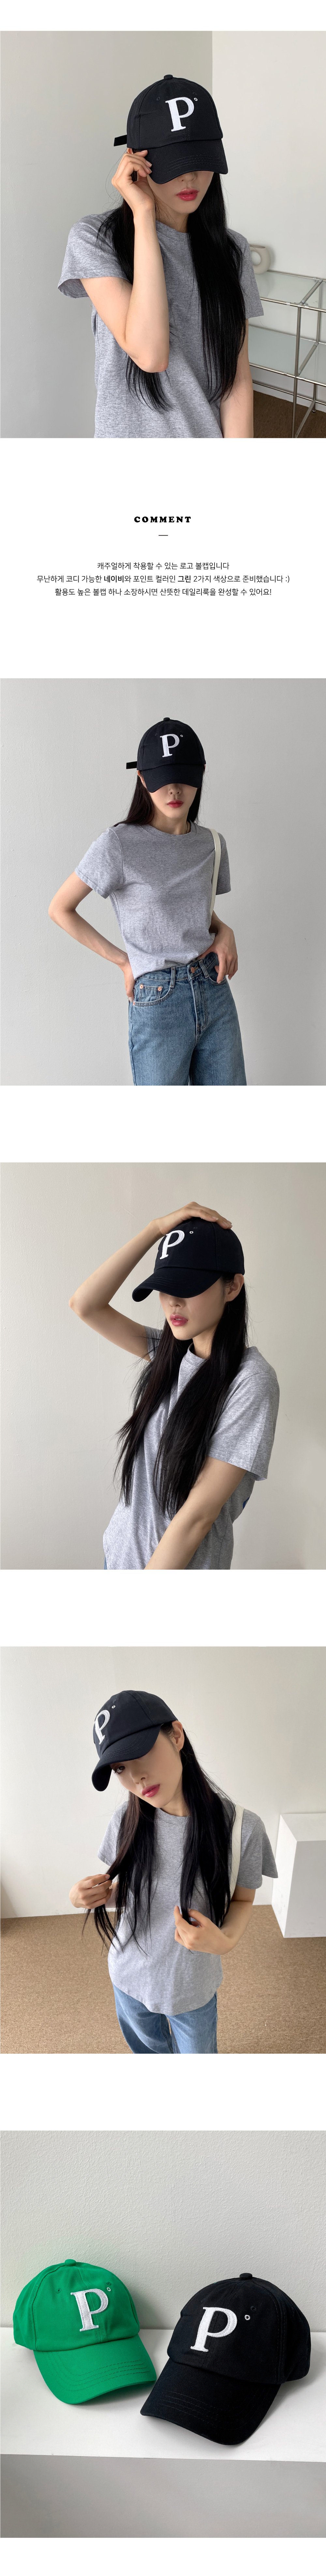 Fave P Logo Daily Ball Cap